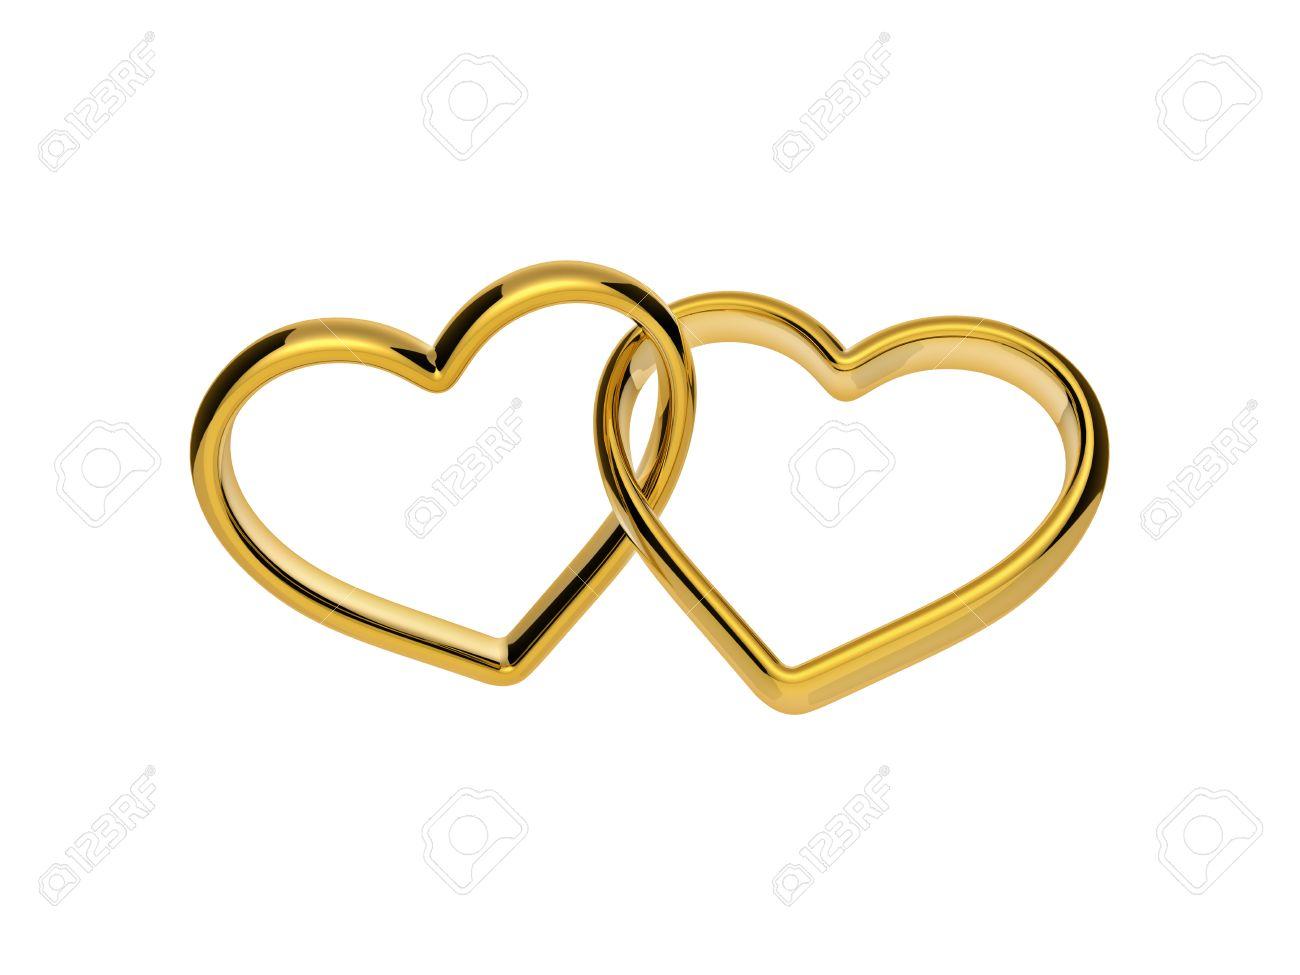 d corazones de oro conectados entre s anillos enlazados smbolo de matrimonio foto de